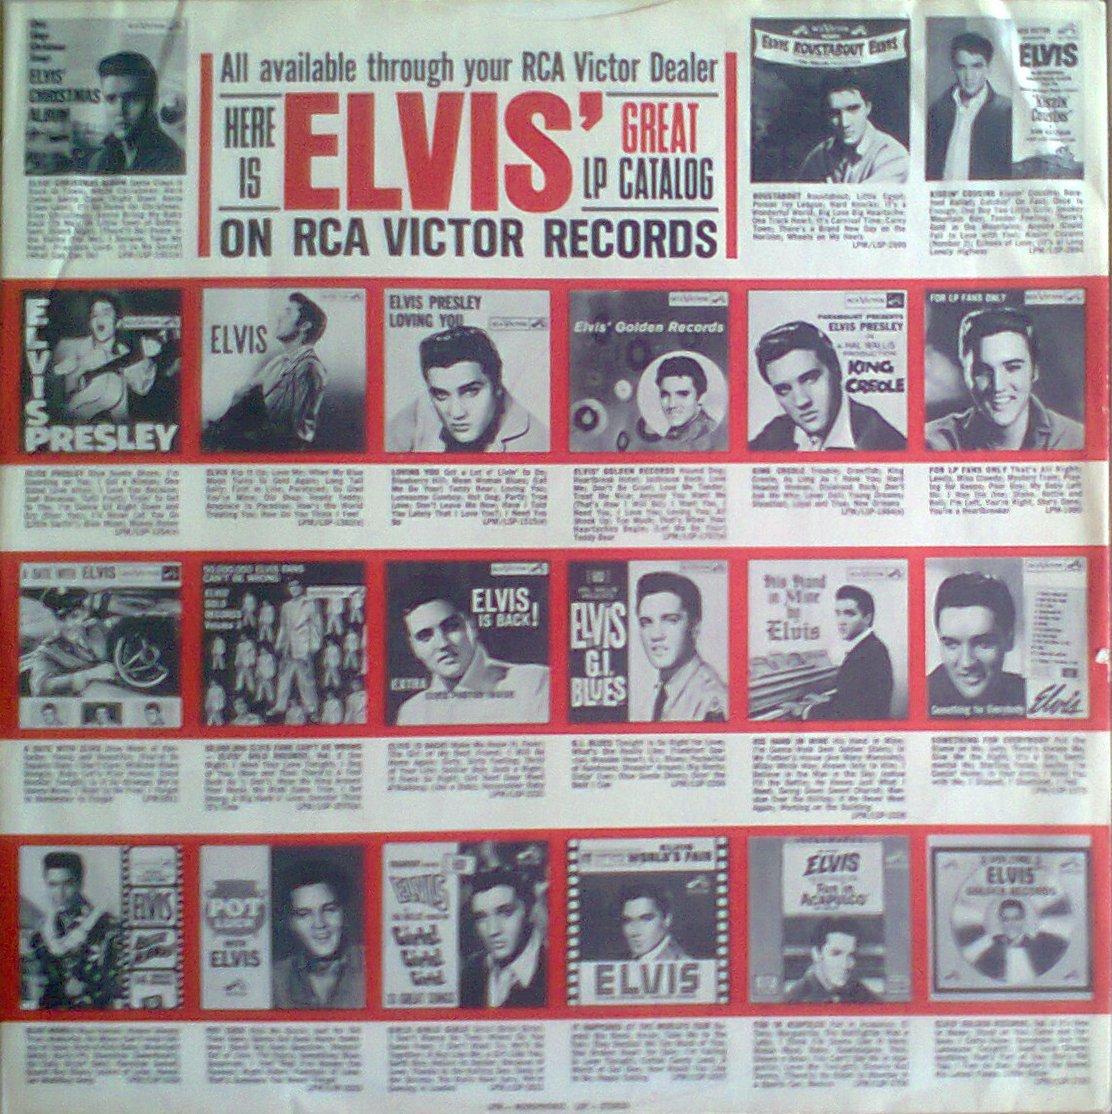 ELVIS' GOLD RECORDS VOL 2 Foto02629yipt